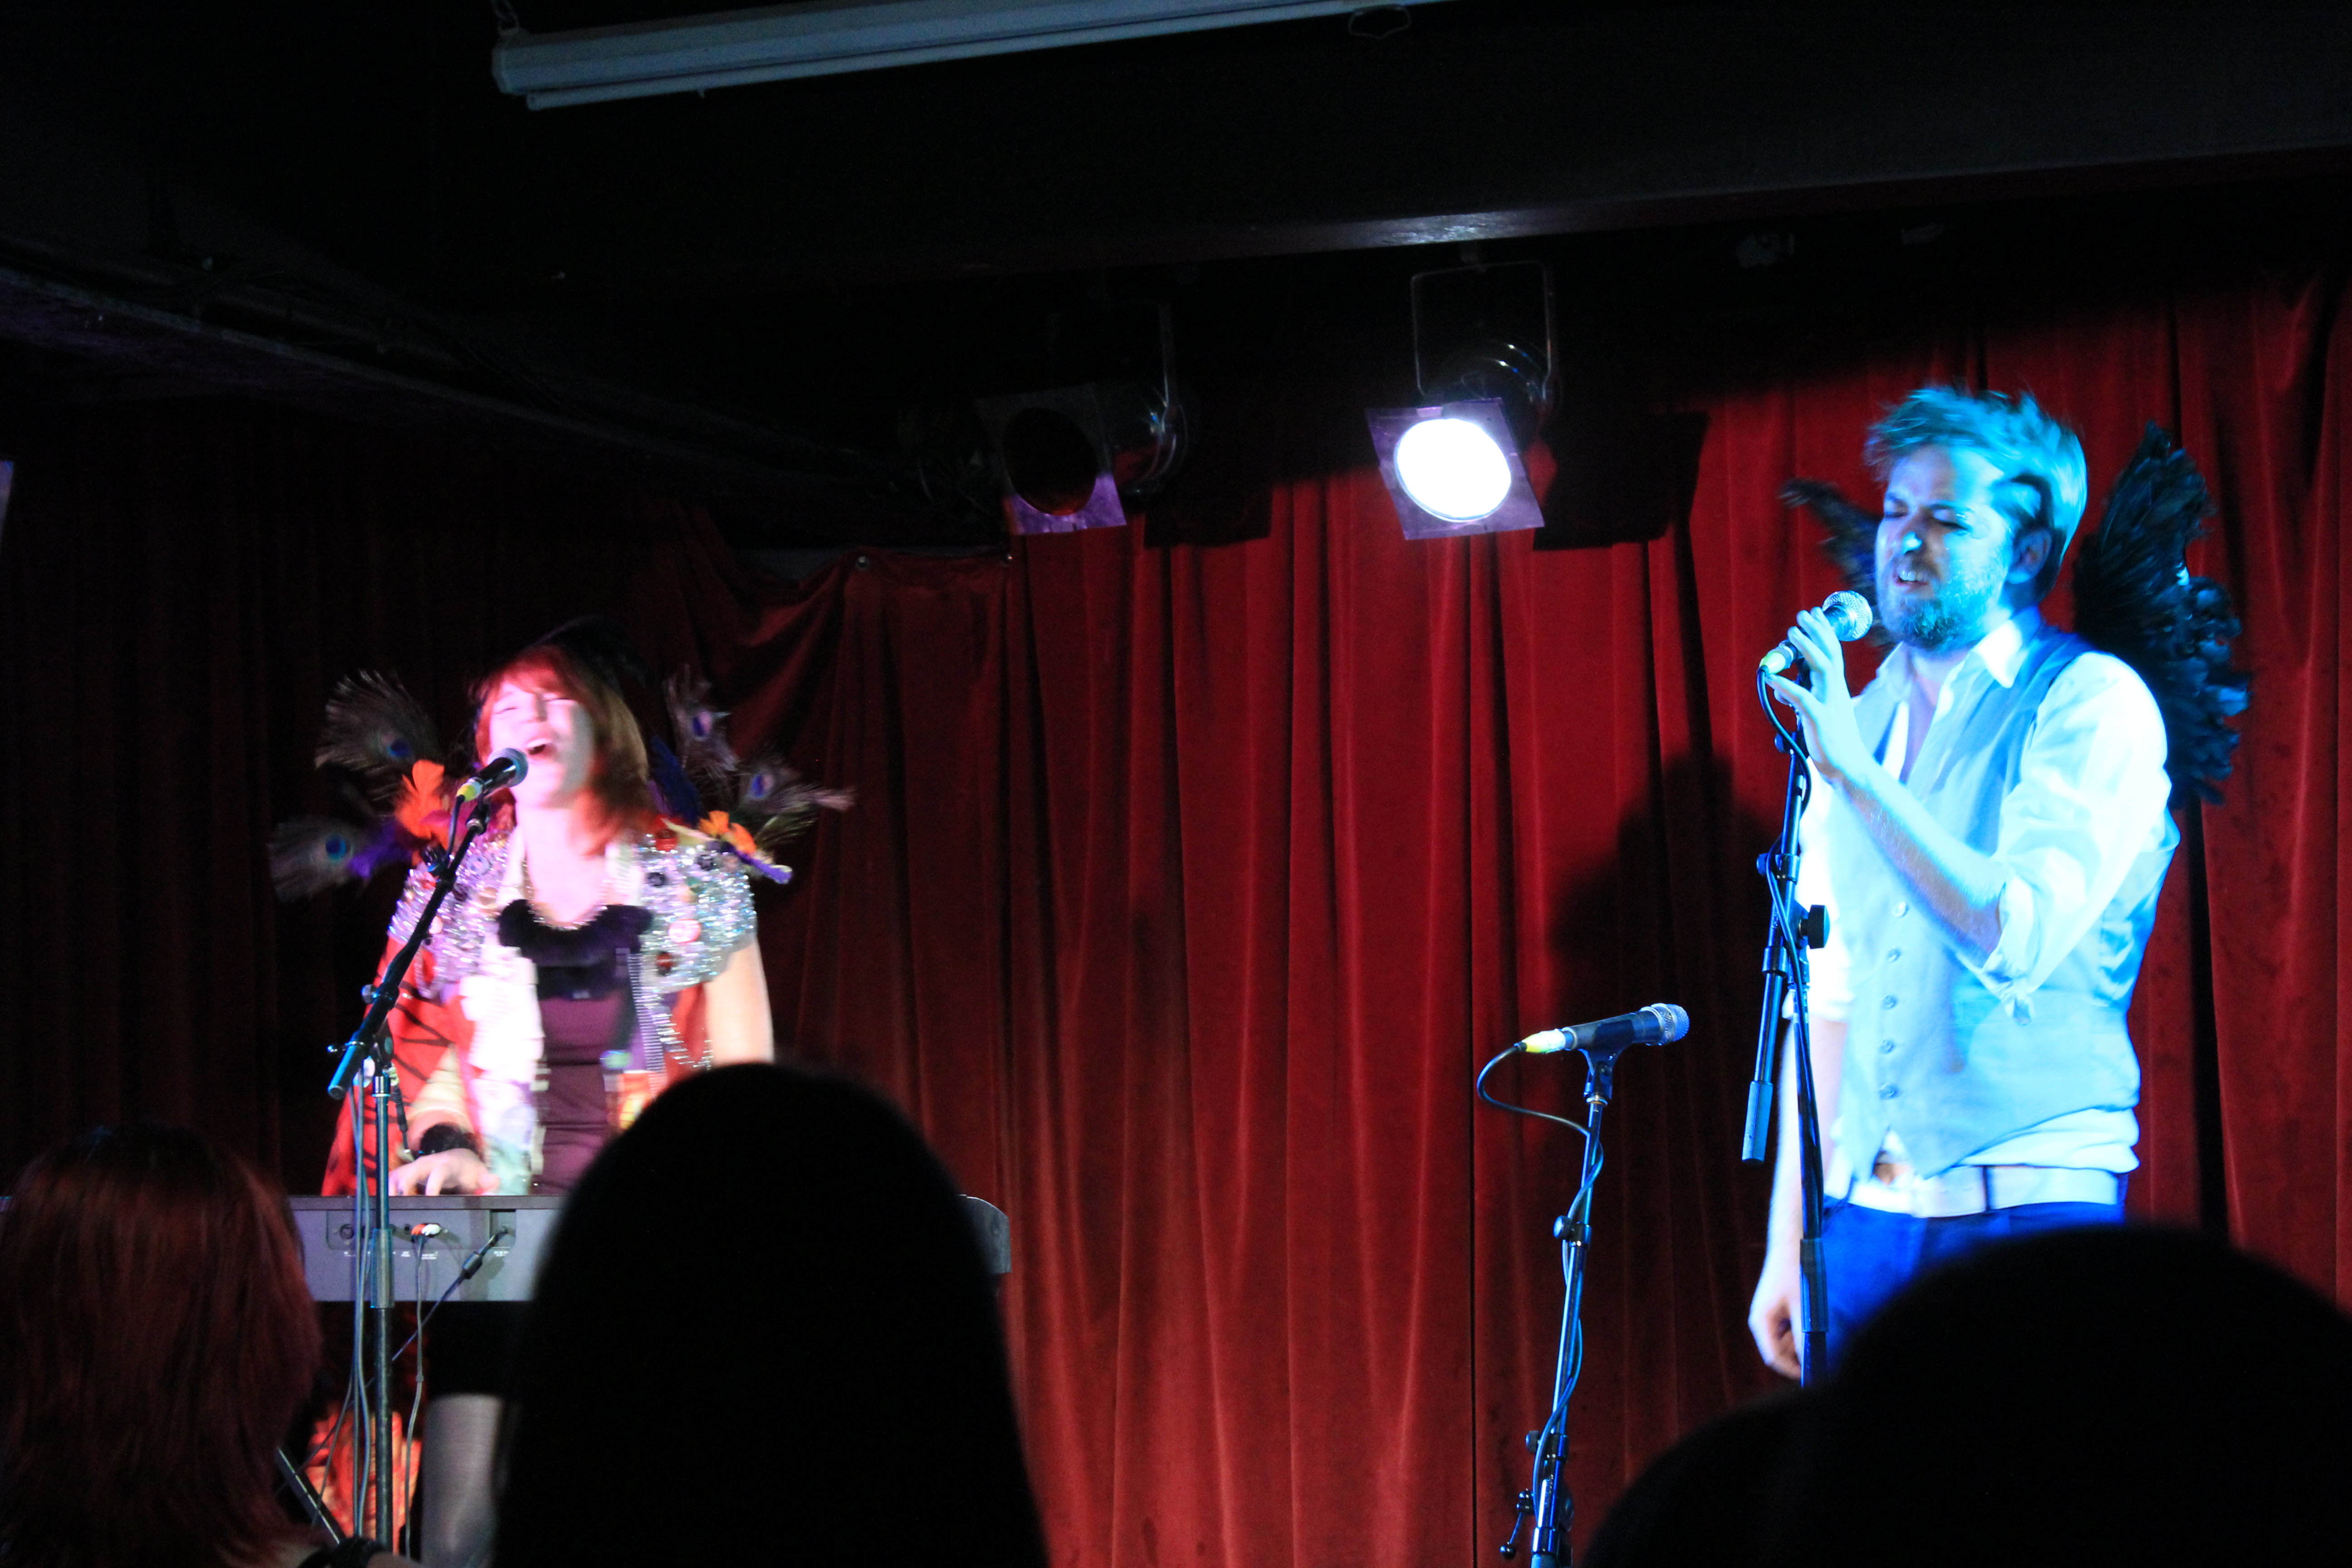 Jen Kingwell and Tom Dickins